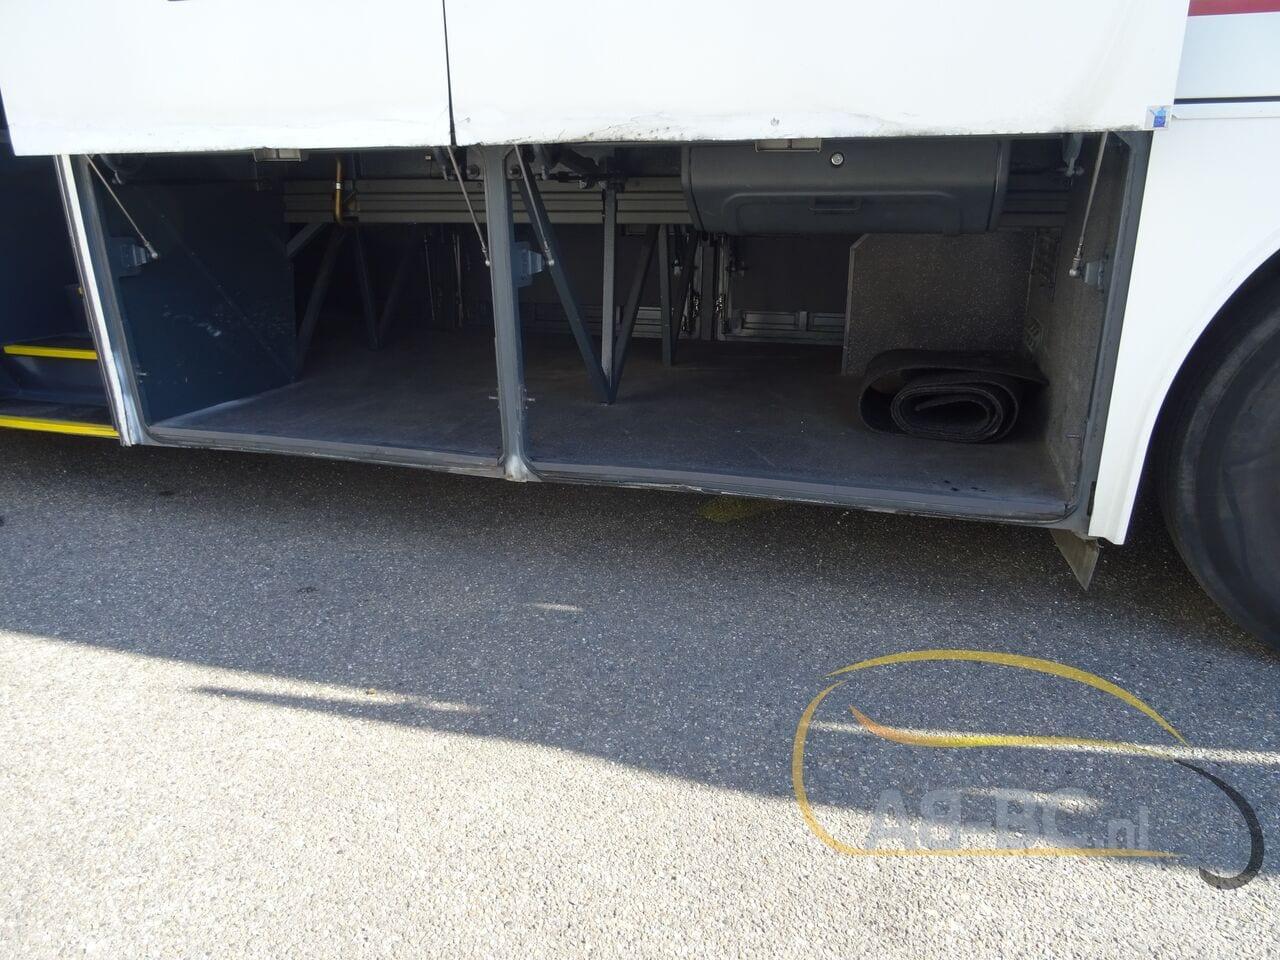 coach-busTEMSA-Safari-RD-53-Seats-DAF-Motor-12-mtr---1616166463578681624_big_35b4c113fcd8ccbcdac29f0a5283840e--21031917053743807500